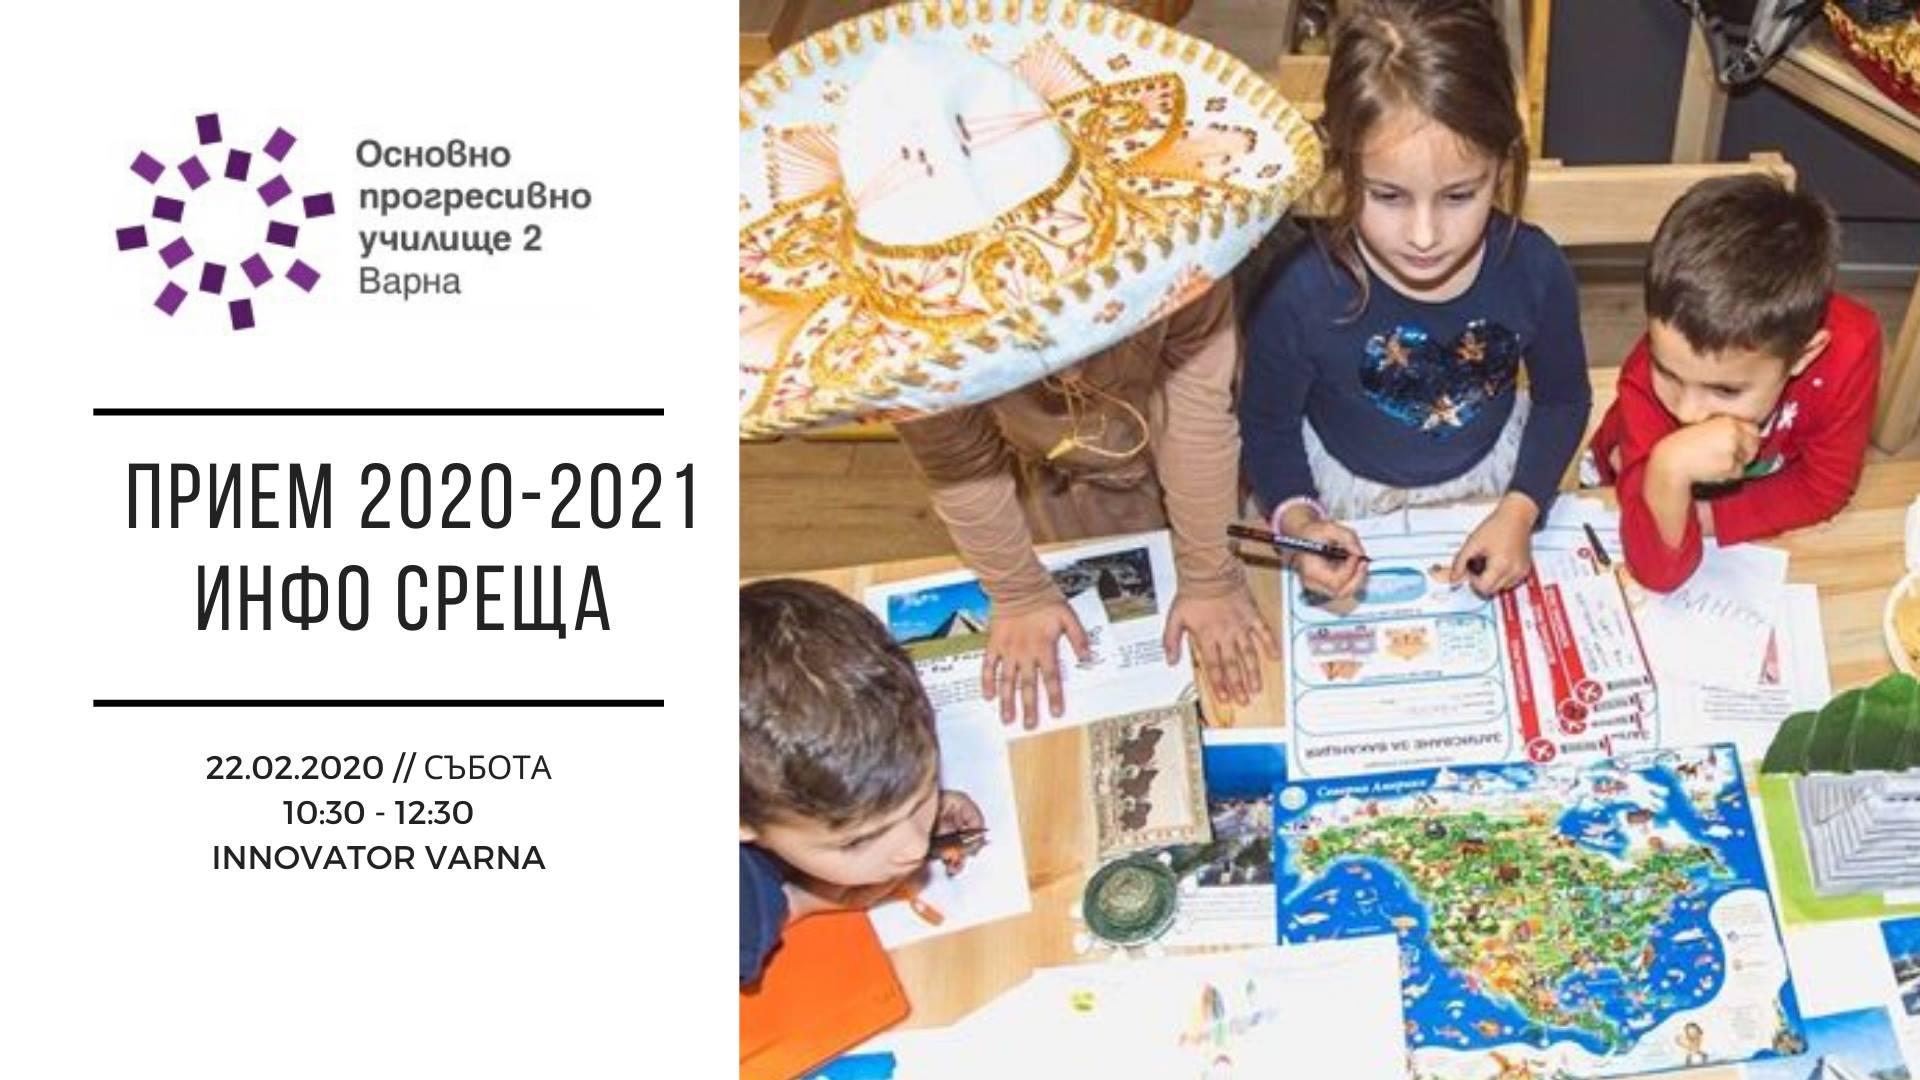 презентация прием 2020 ОПУ2 Варна